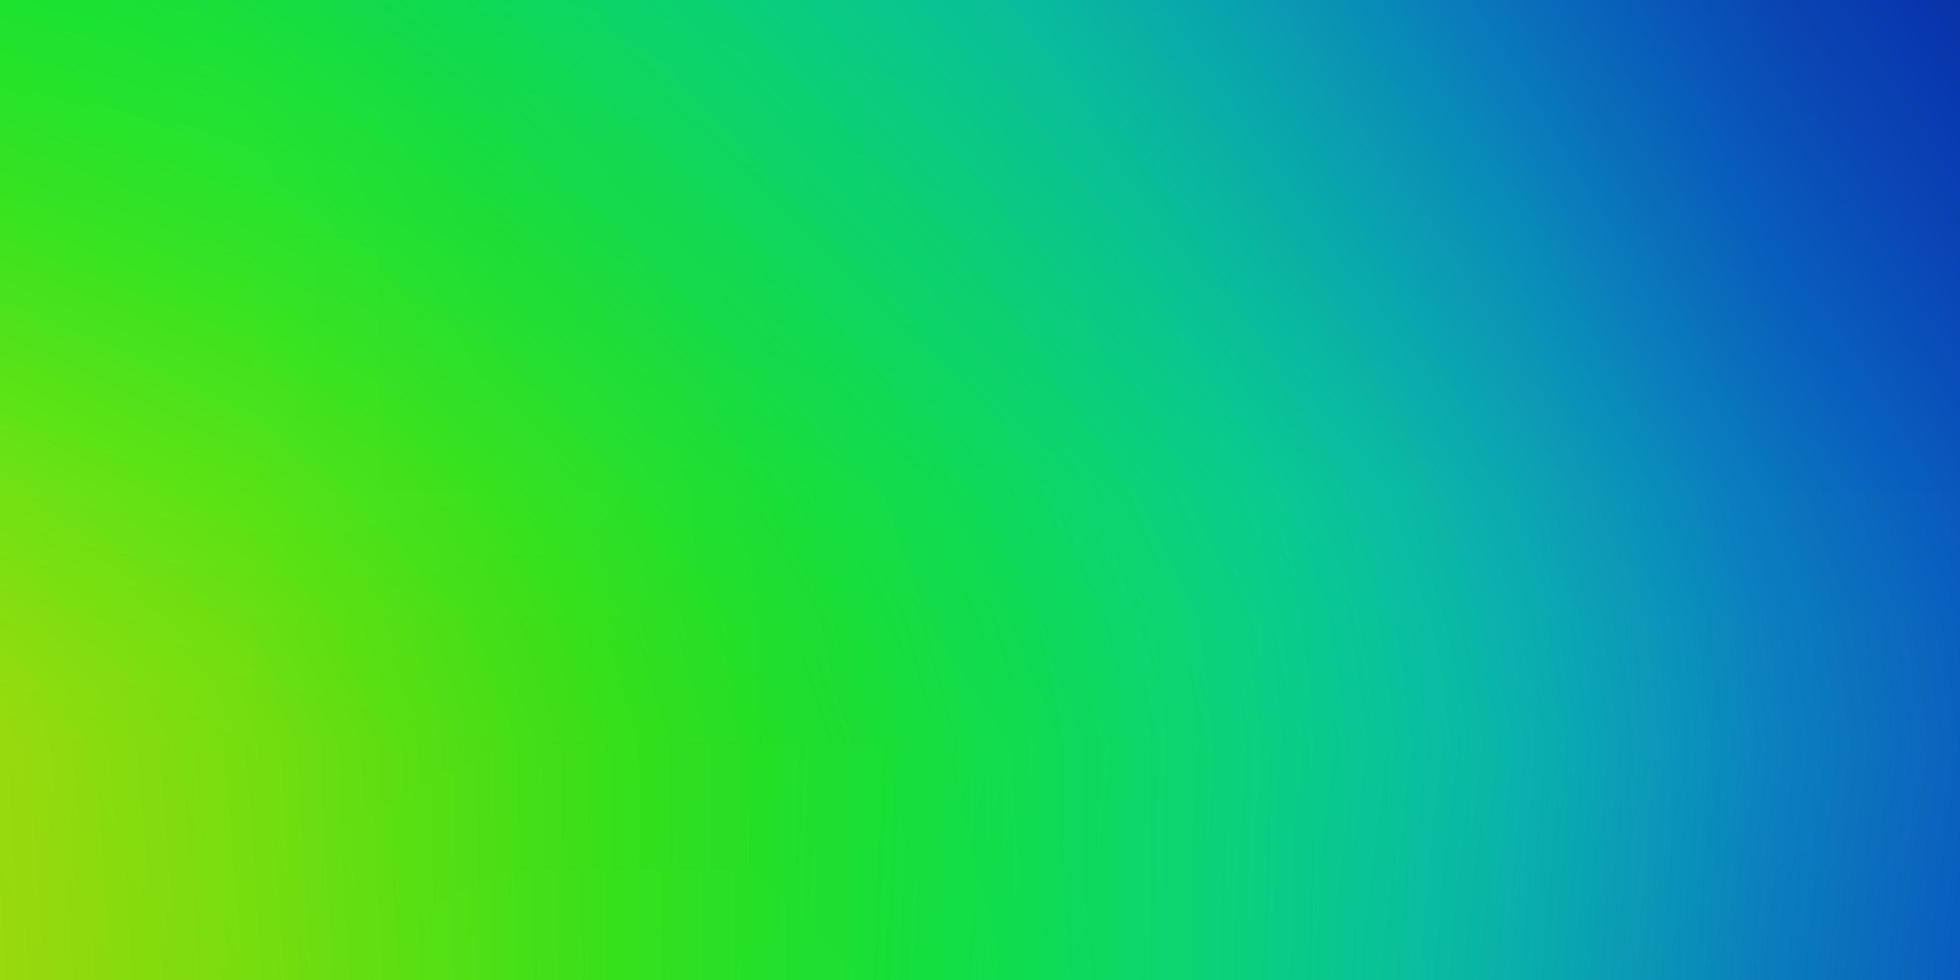 luz azul, verde vetor abstrato turva fundo.